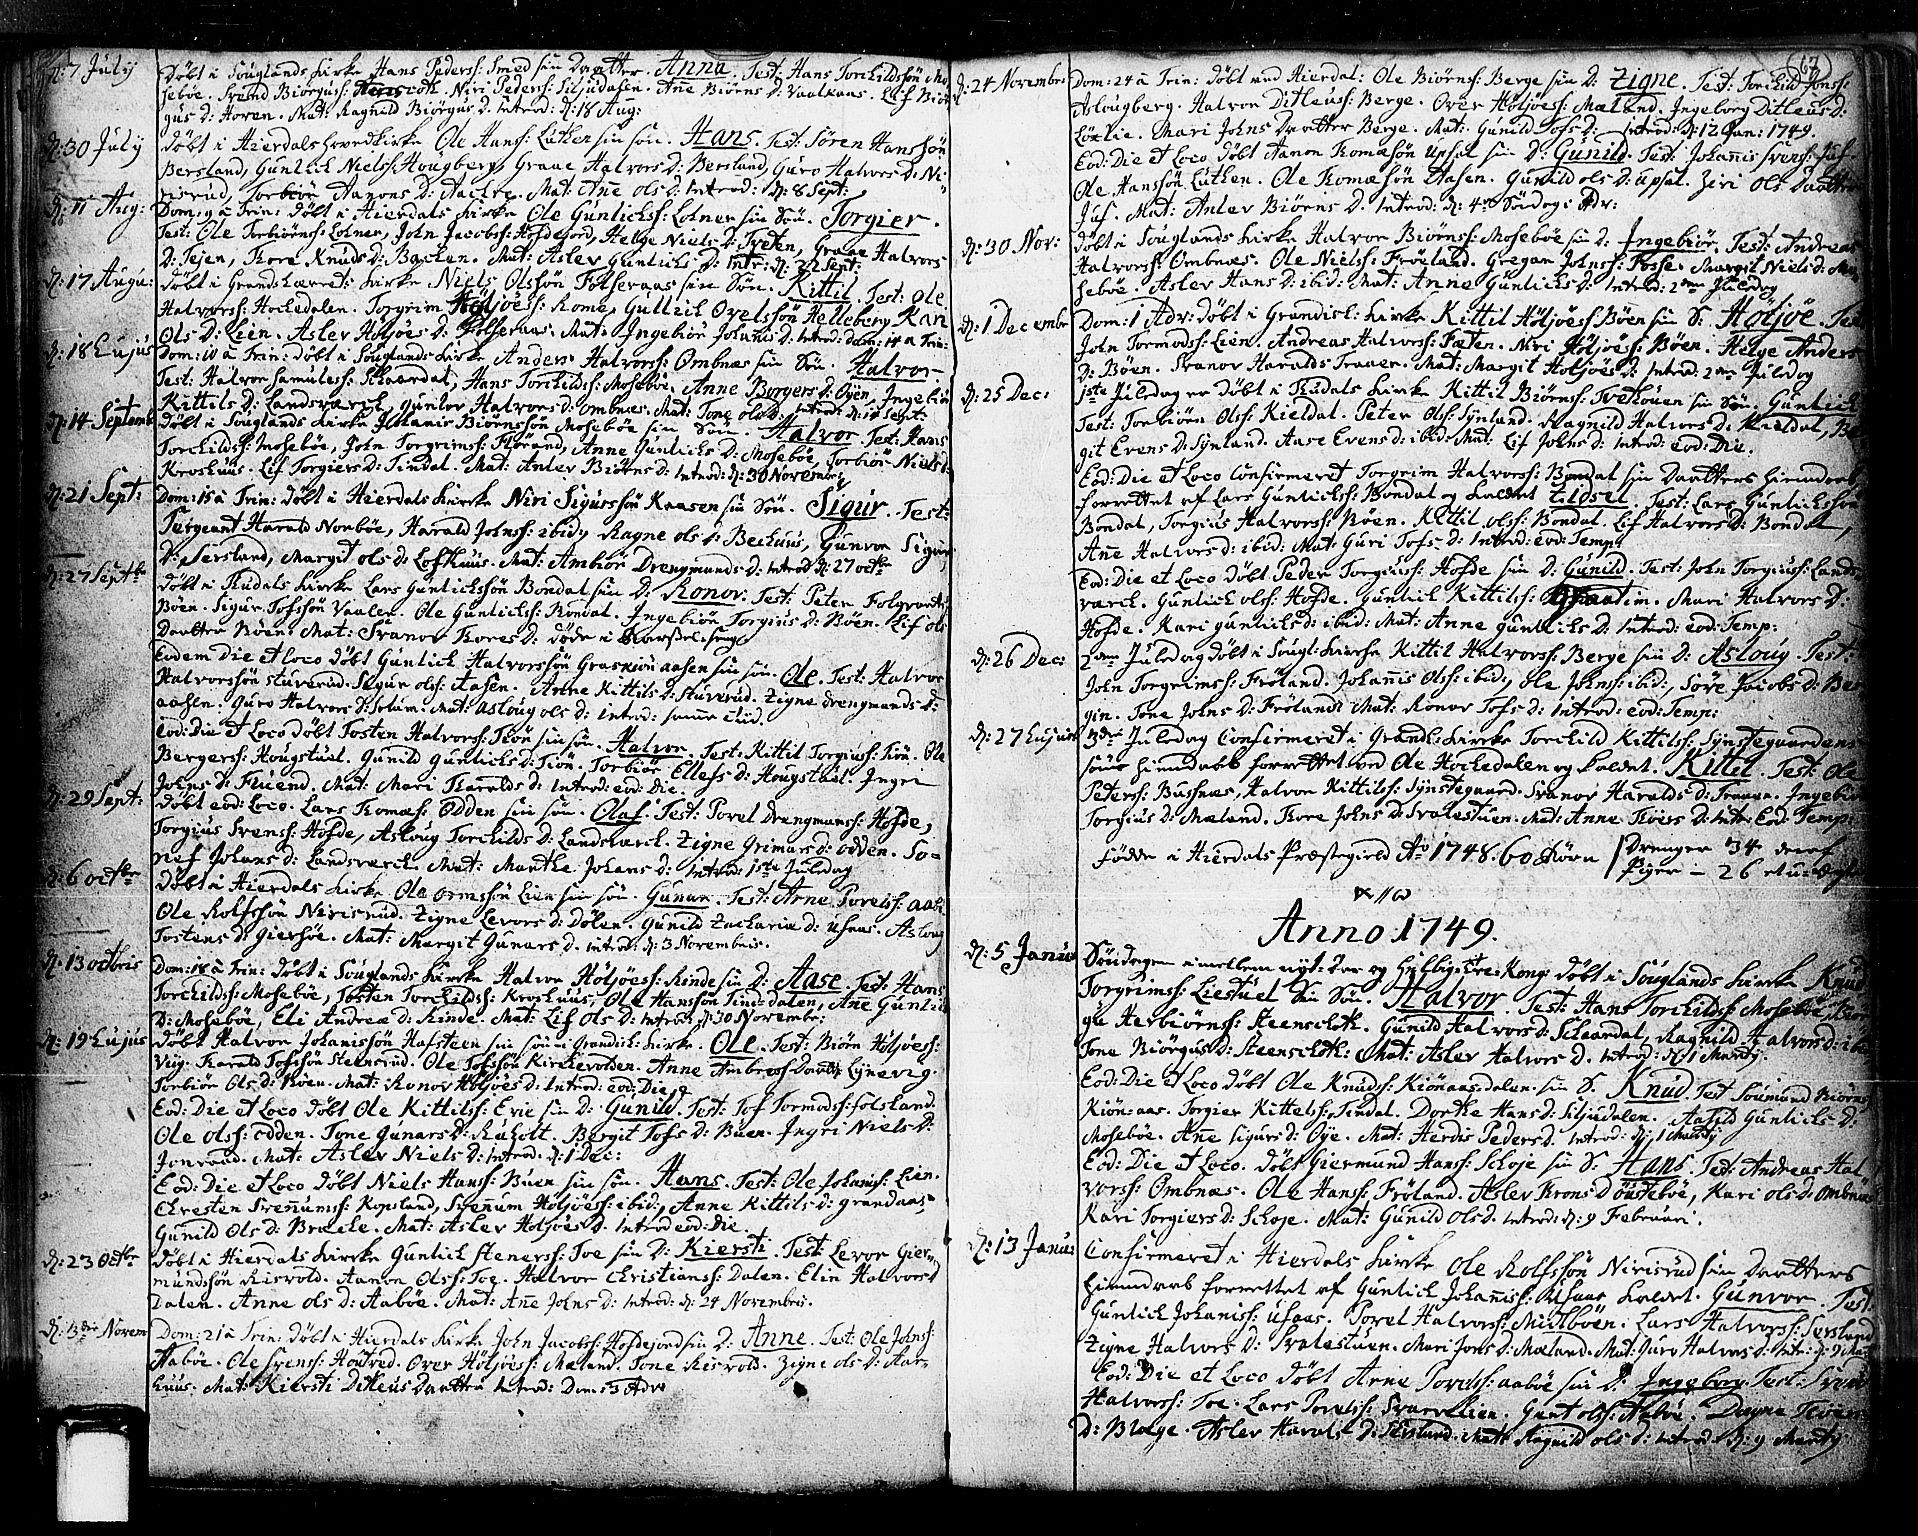 SAKO, Hjartdal kirkebøker, F/Fa/L0003: Ministerialbok nr. I 3, 1727-1775, s. 67